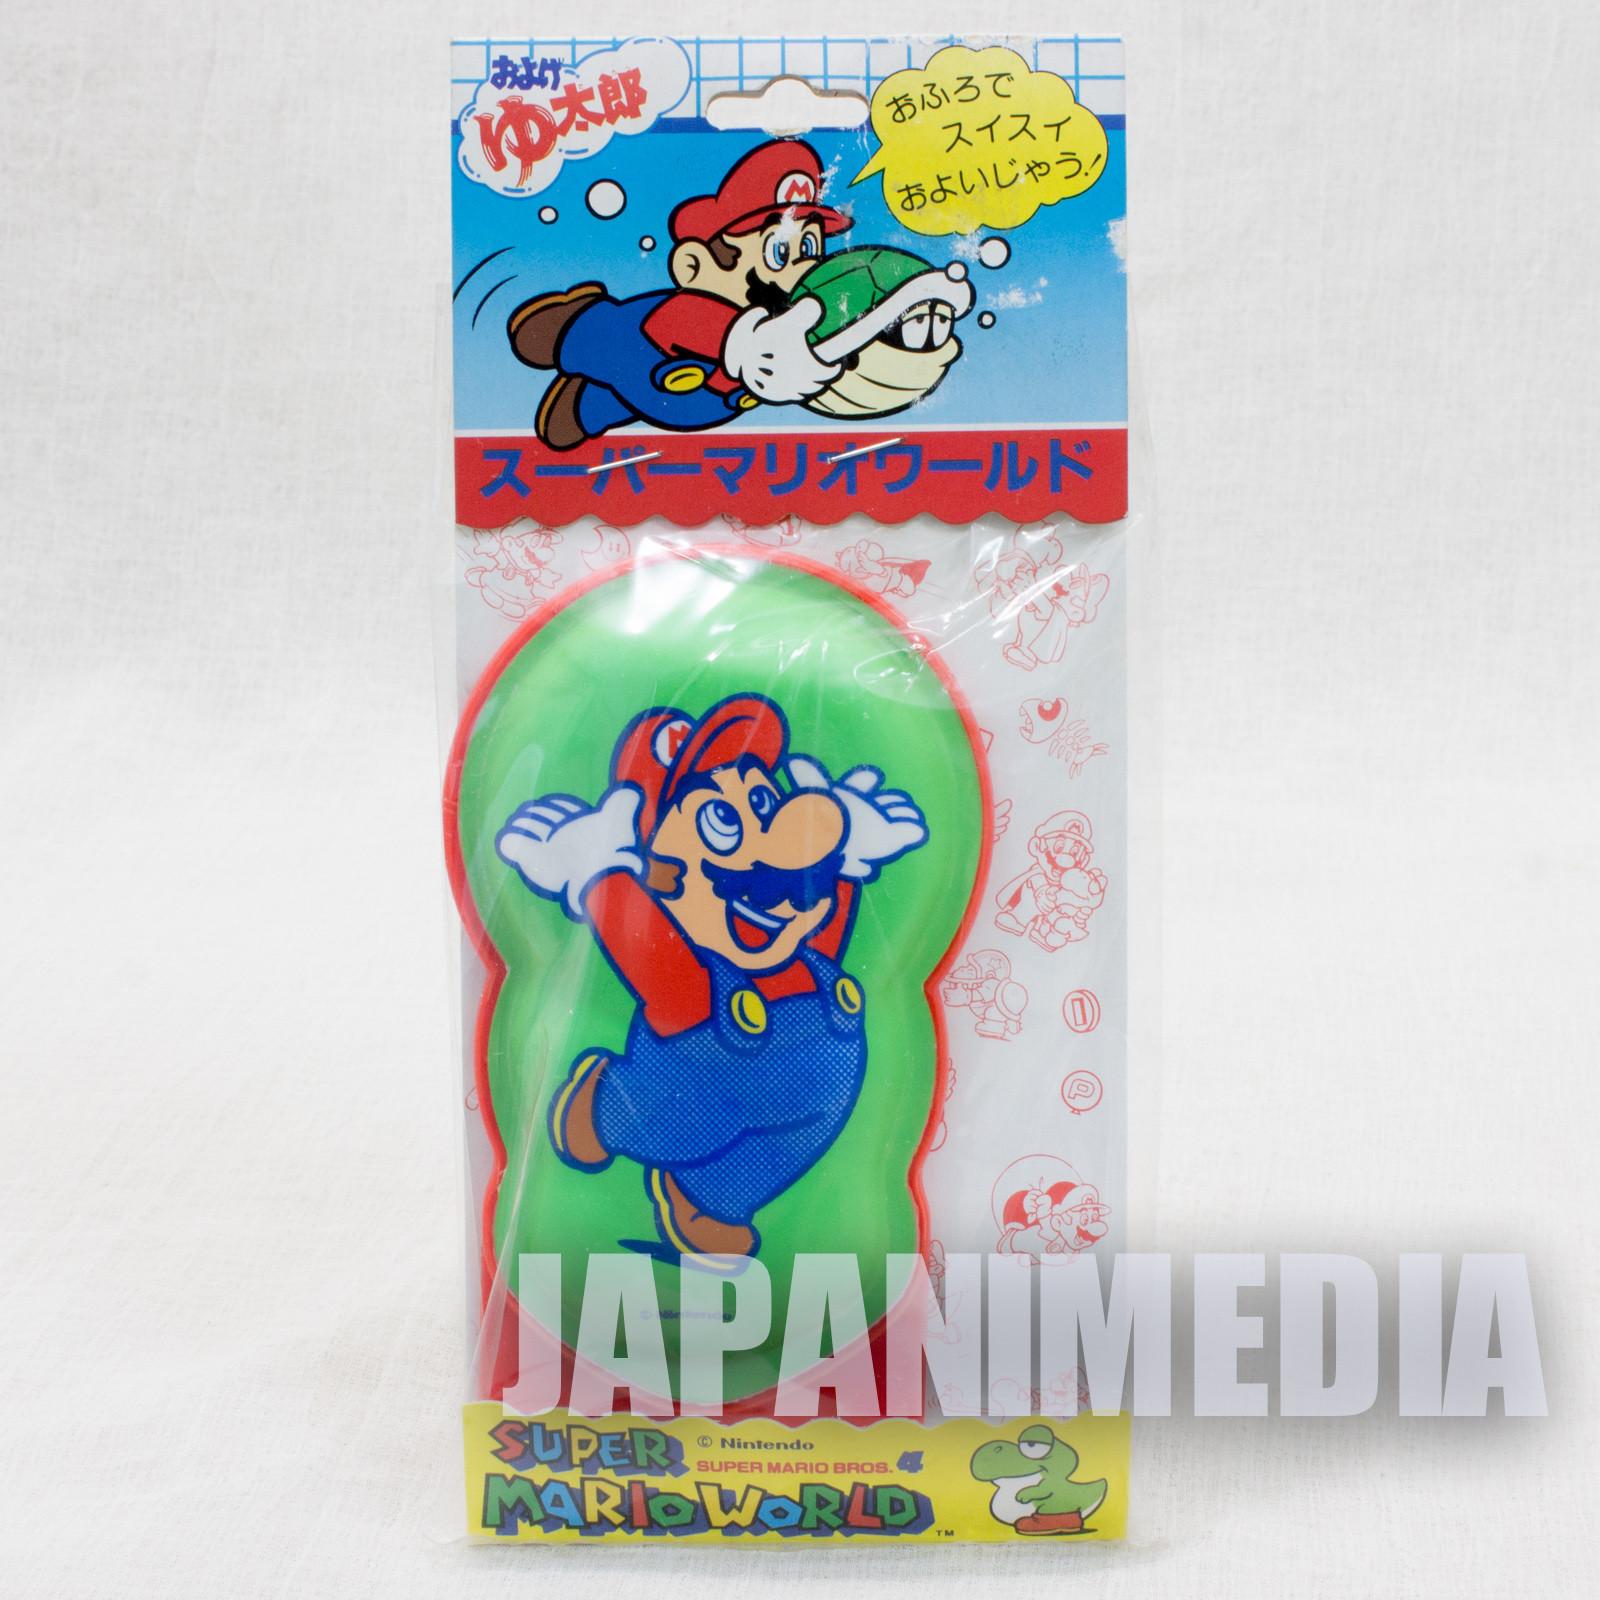 Retro RARE Super Mario World Both Toy Tsukuda Hobby JAPAN NINTENDO